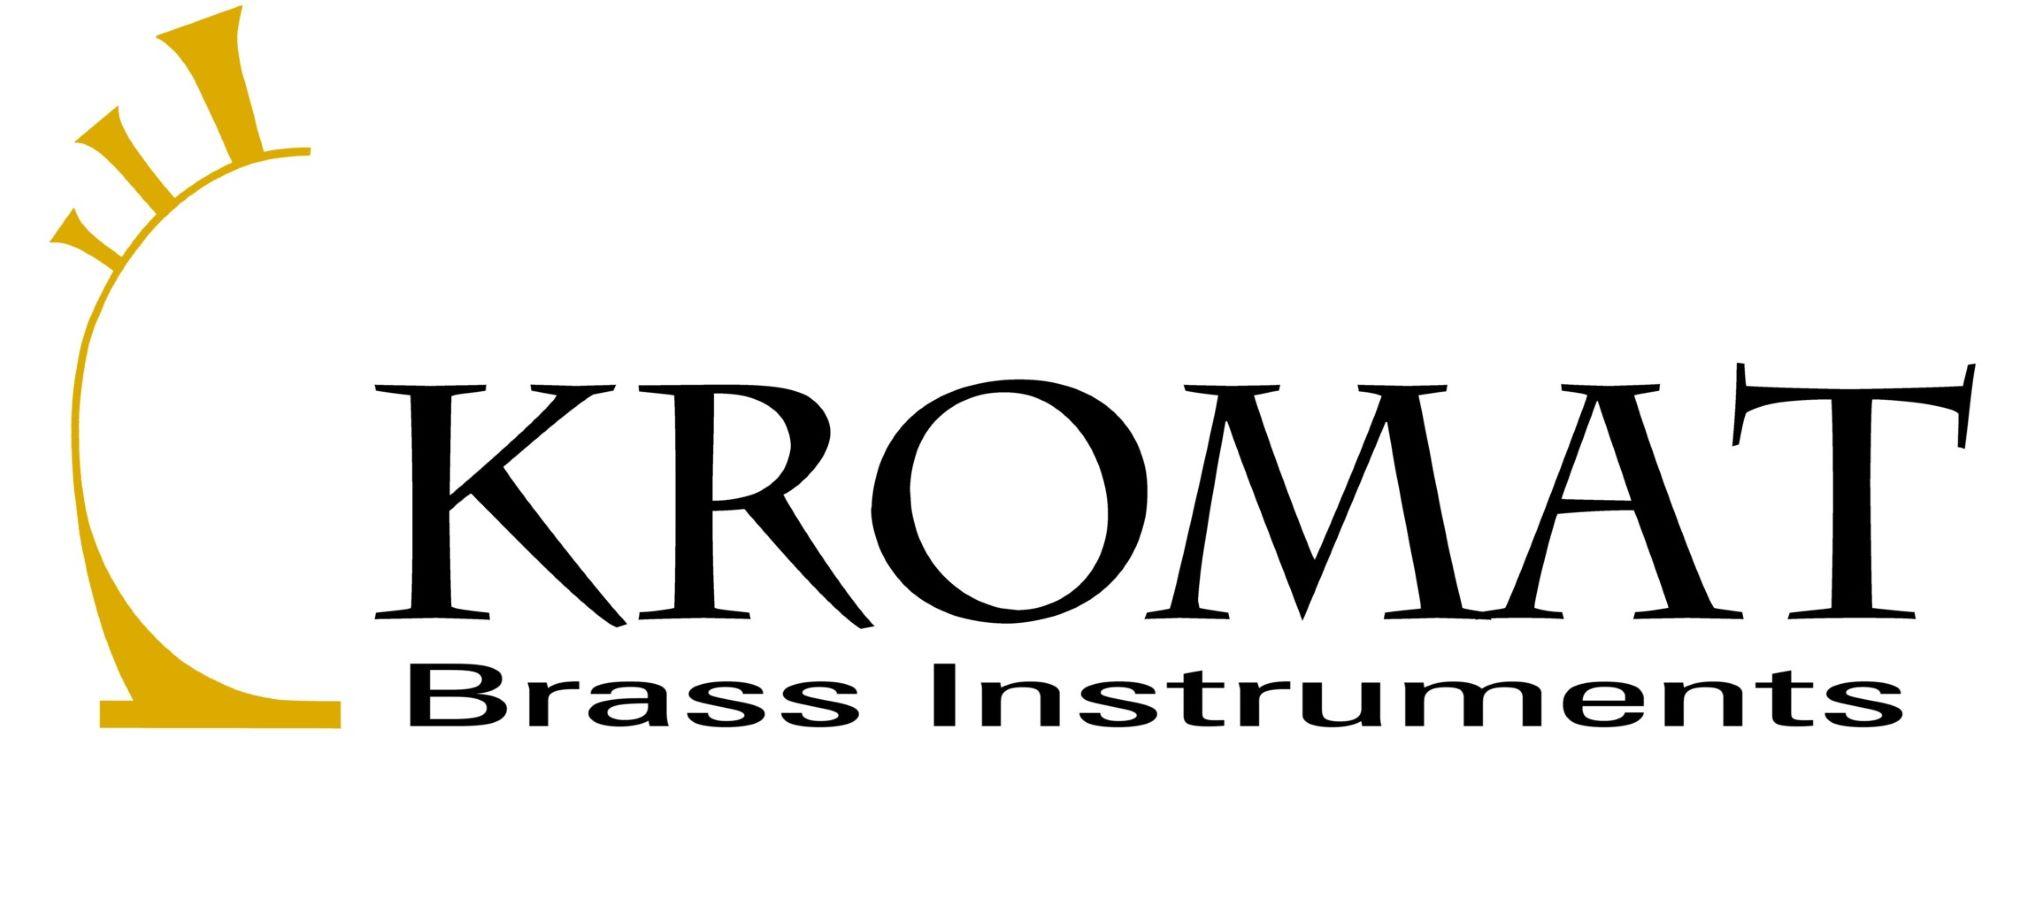 Kromat Brass Instruments